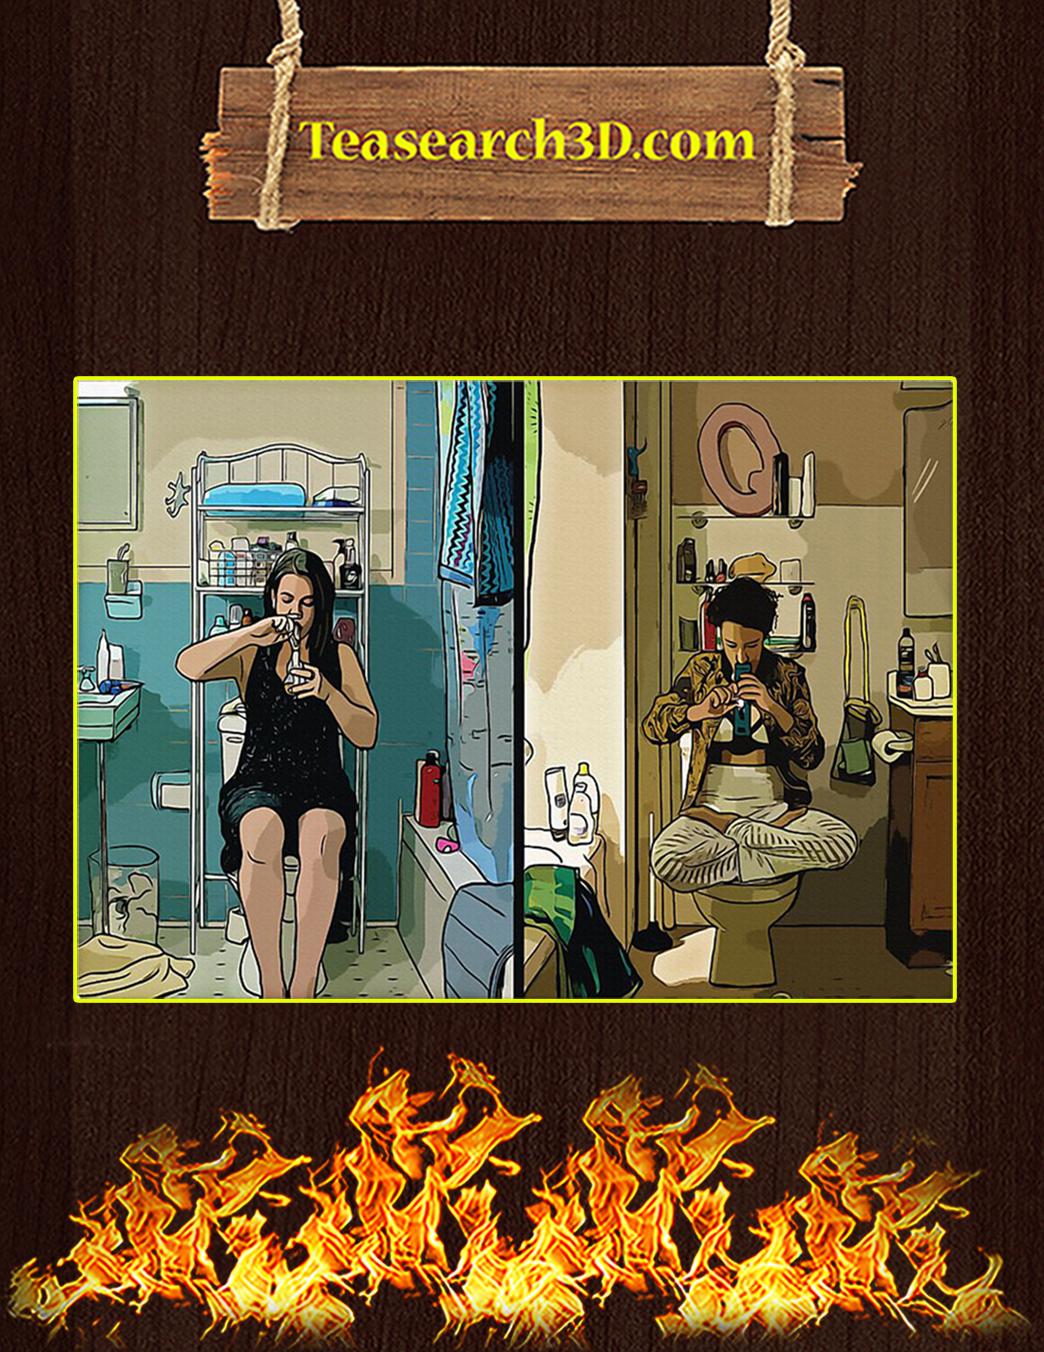 Abbi and Ilana In Bathroom Broad City Poster A1